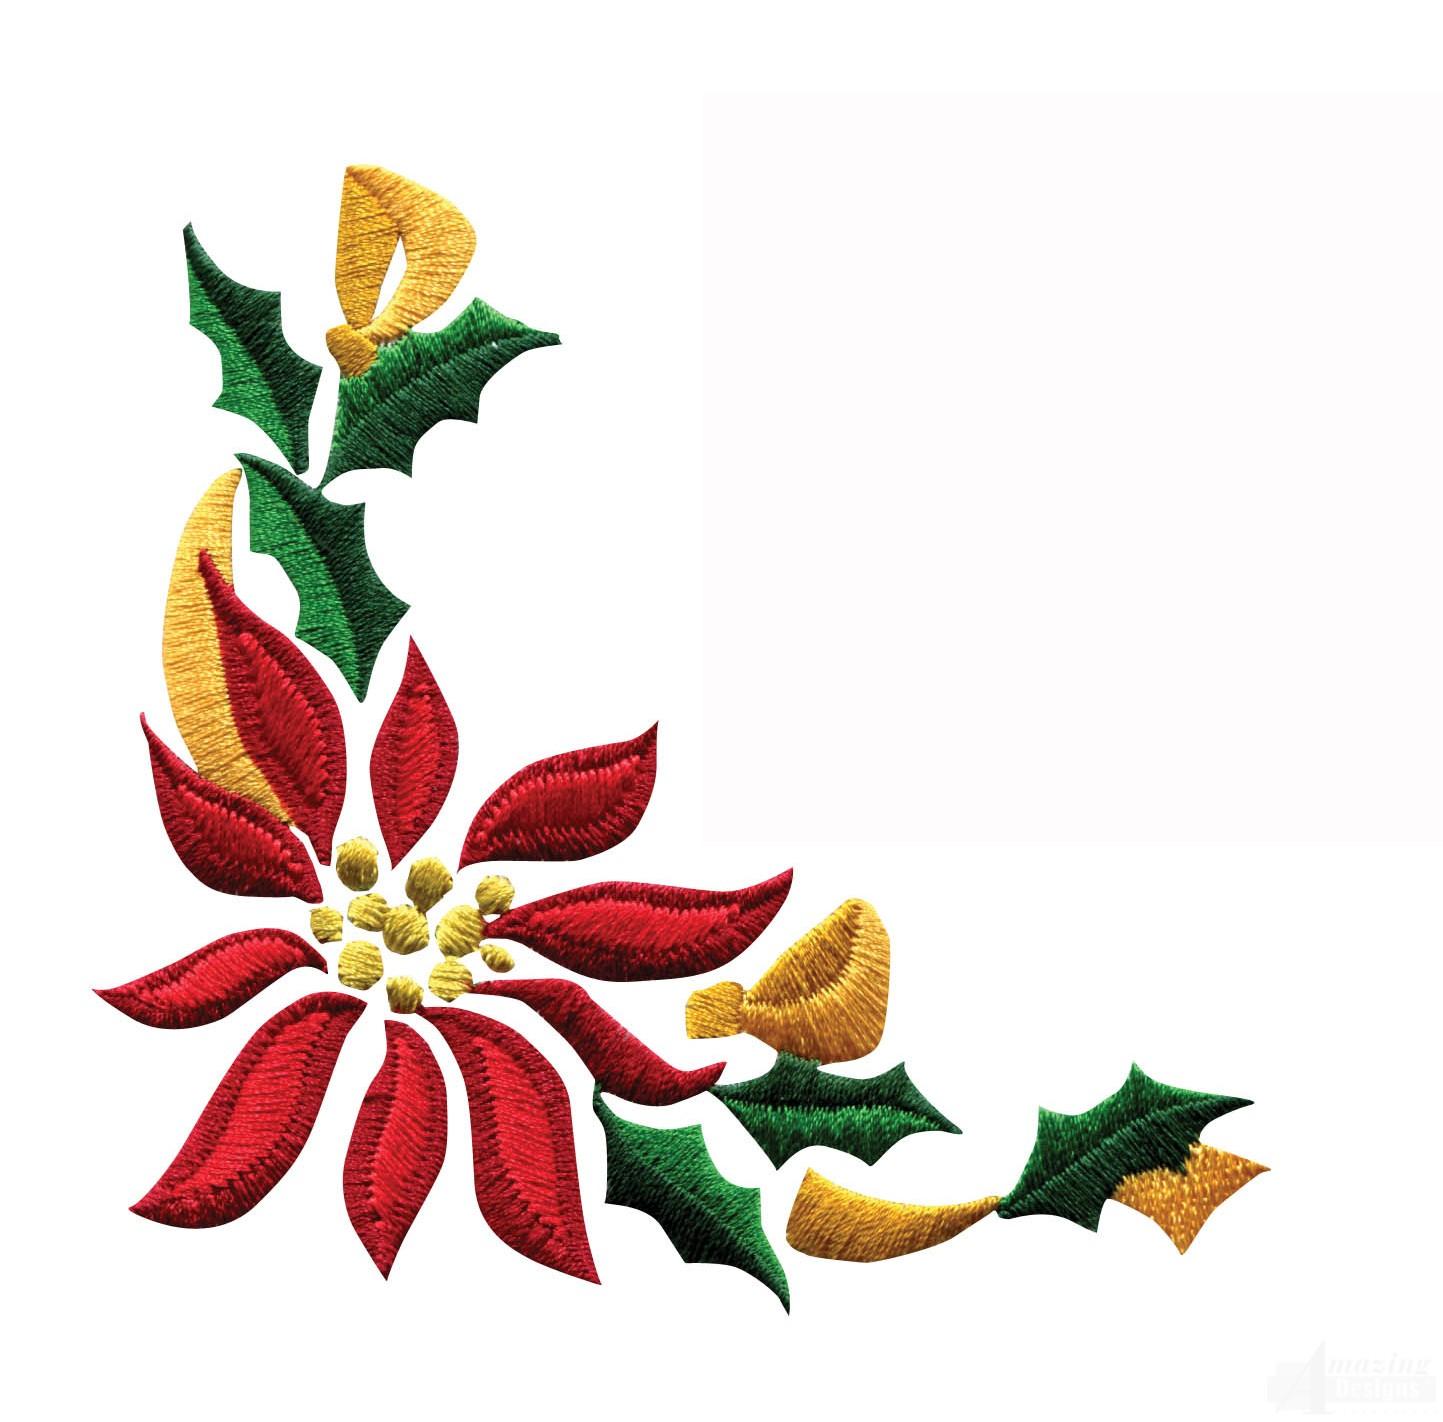 1443x1422 Poinsettia Clipart Horizontal Flower Border